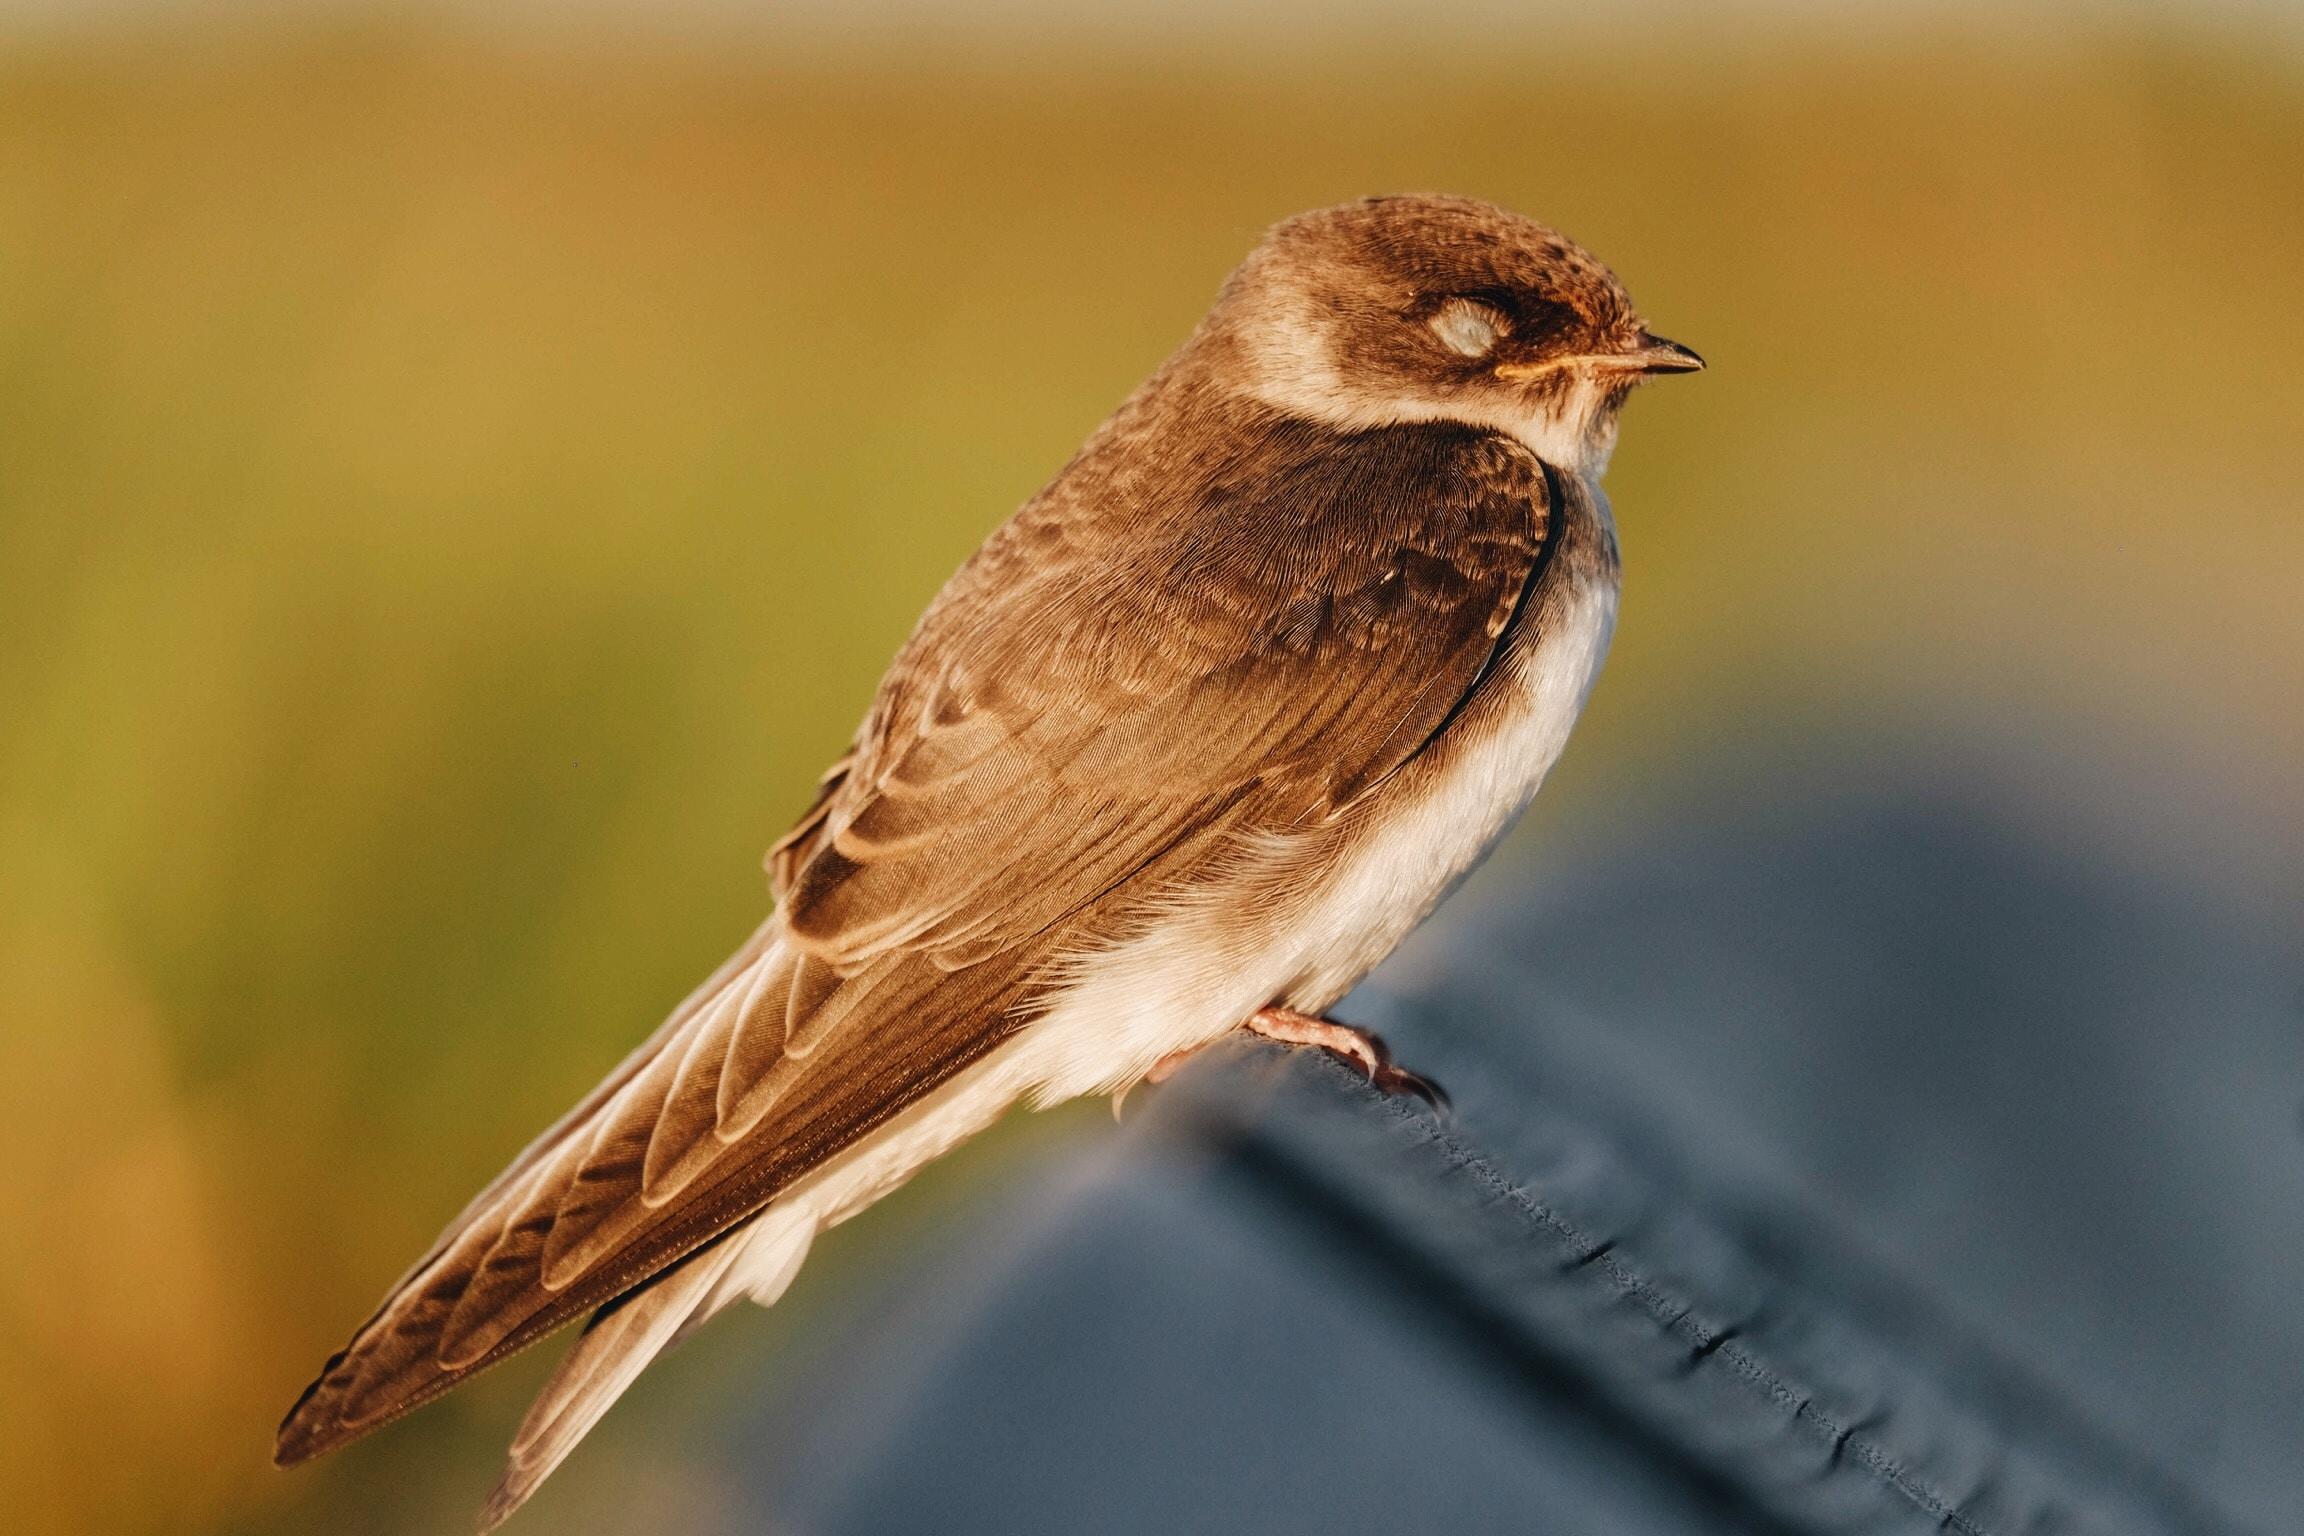 tilt shift lens photography of brown bird